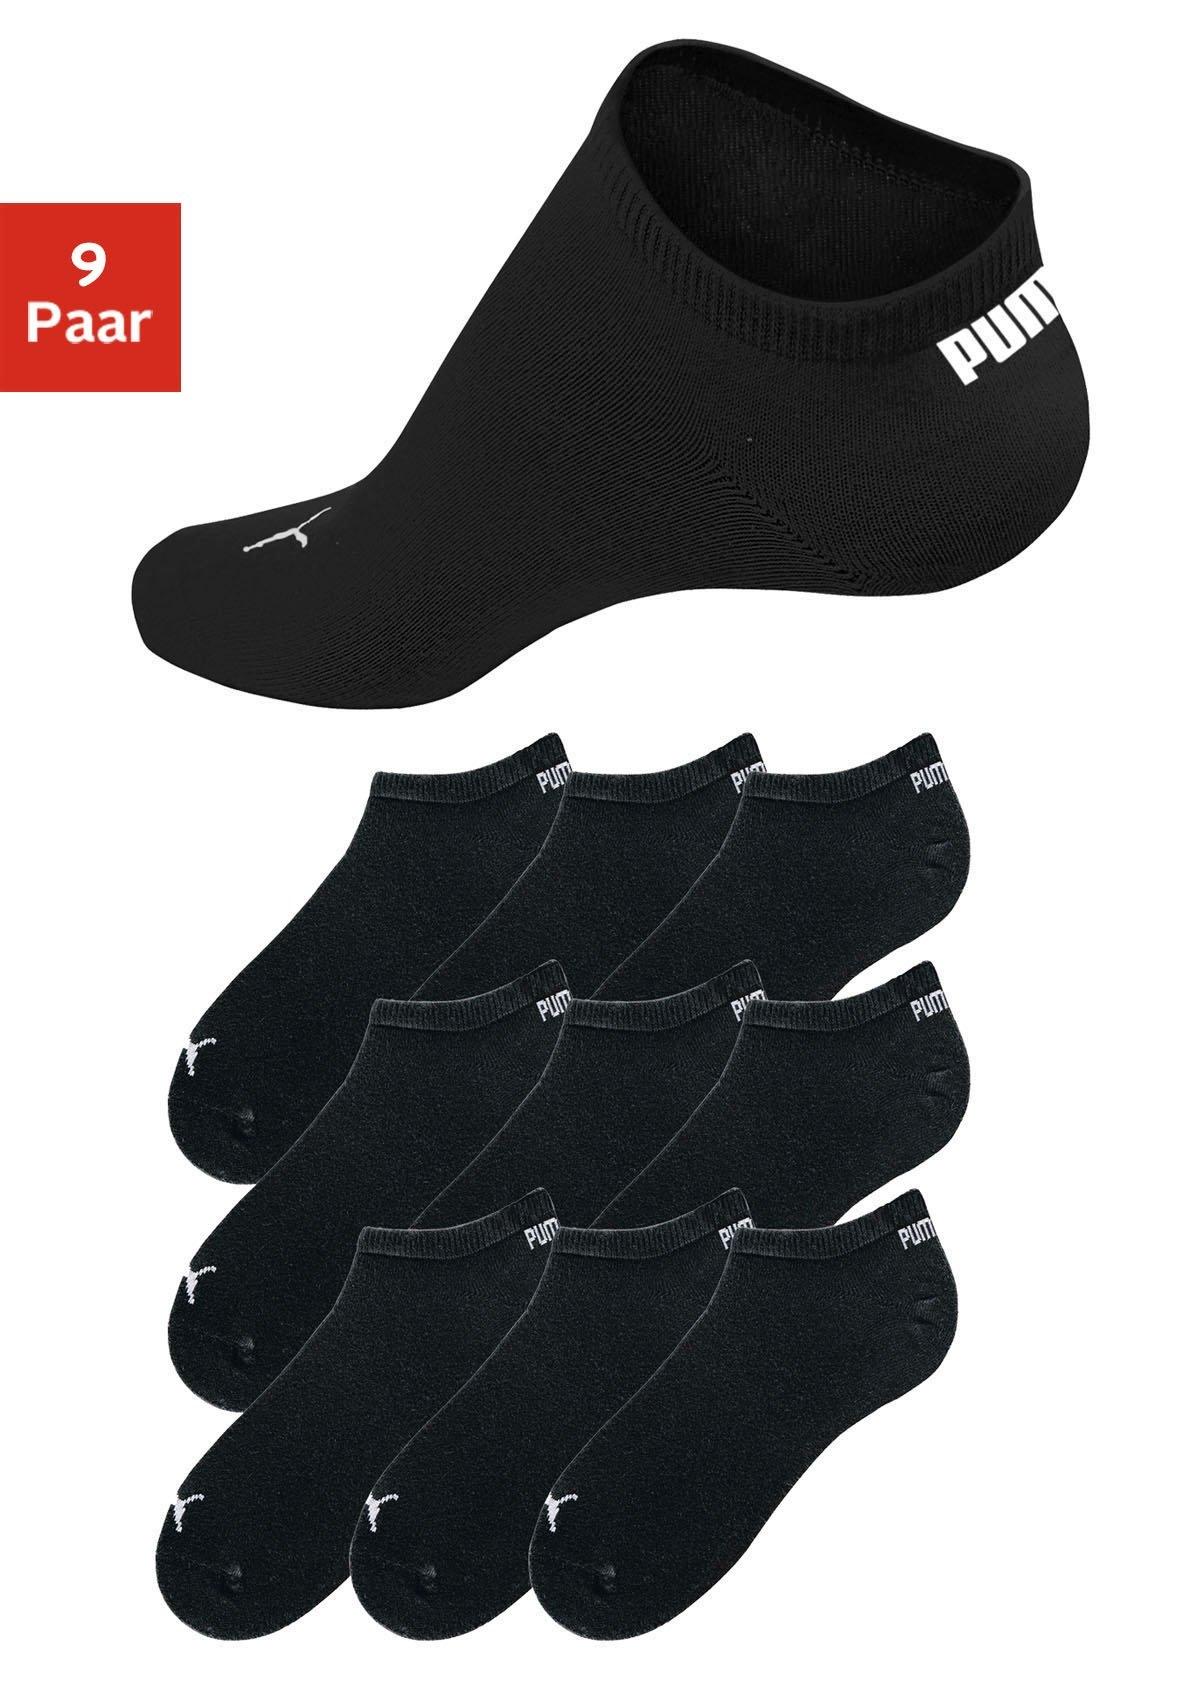 PUMA sneakersokken in klassiek model (9 paar) goedkoop op lascana.nl kopen